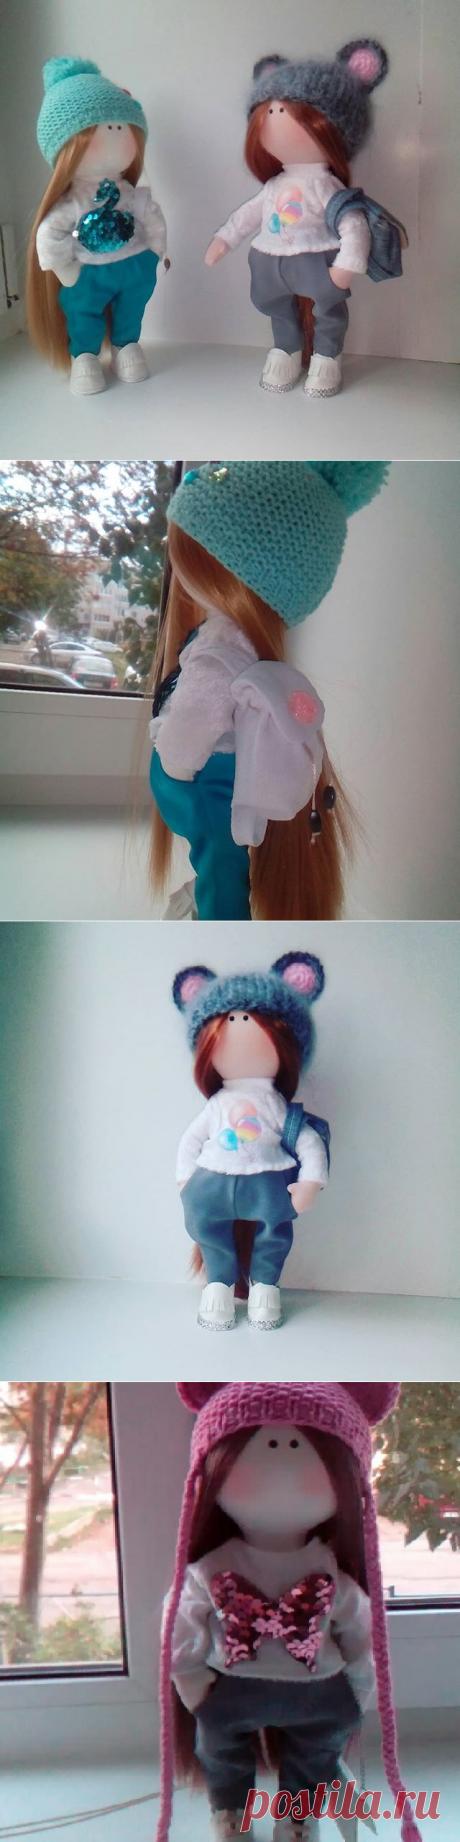 Куклы на заказ (@kukla_lud_mila) • Фото и видео в Instagram